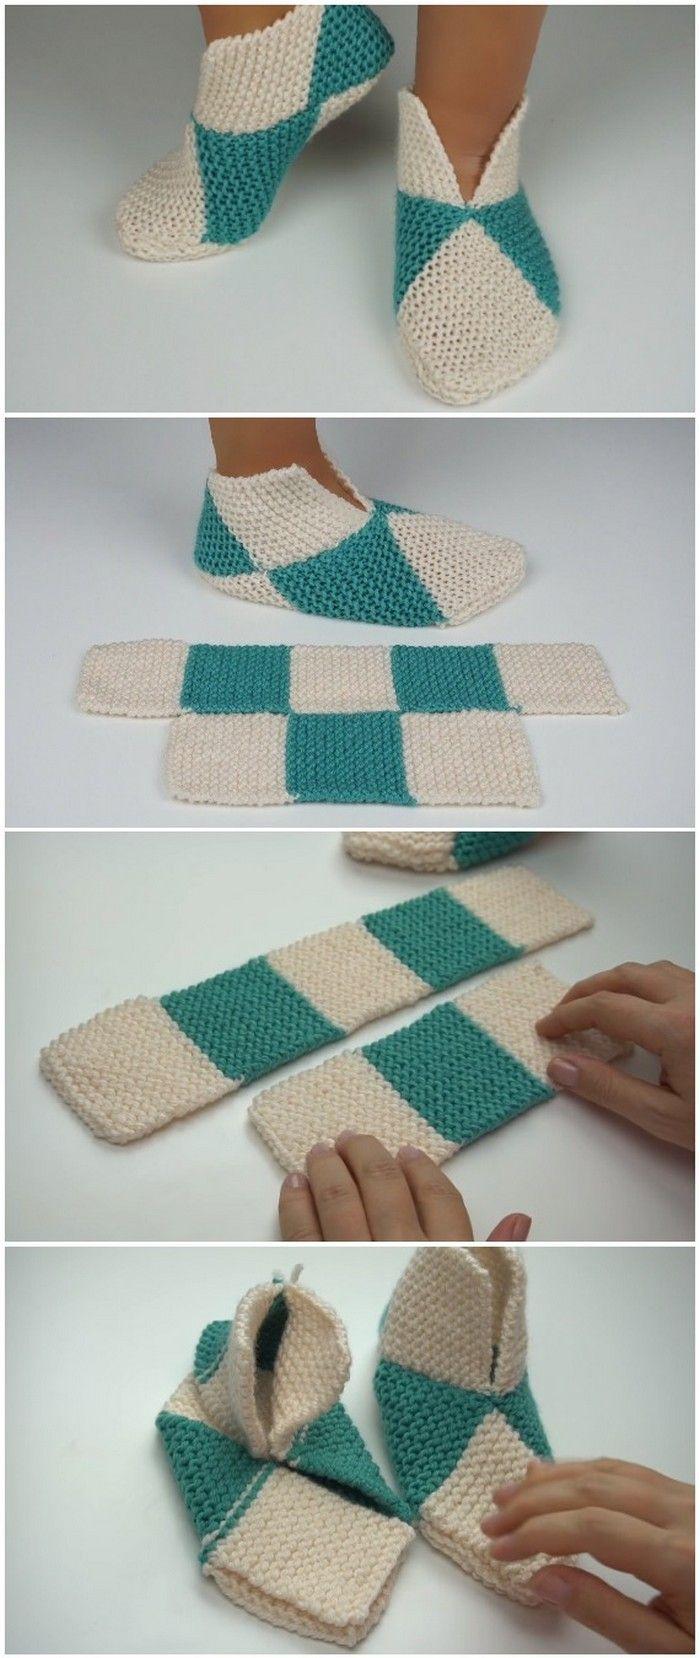 Modern And Latest Crochet Pattern Ideas – Diy & Craft – crochet patterns